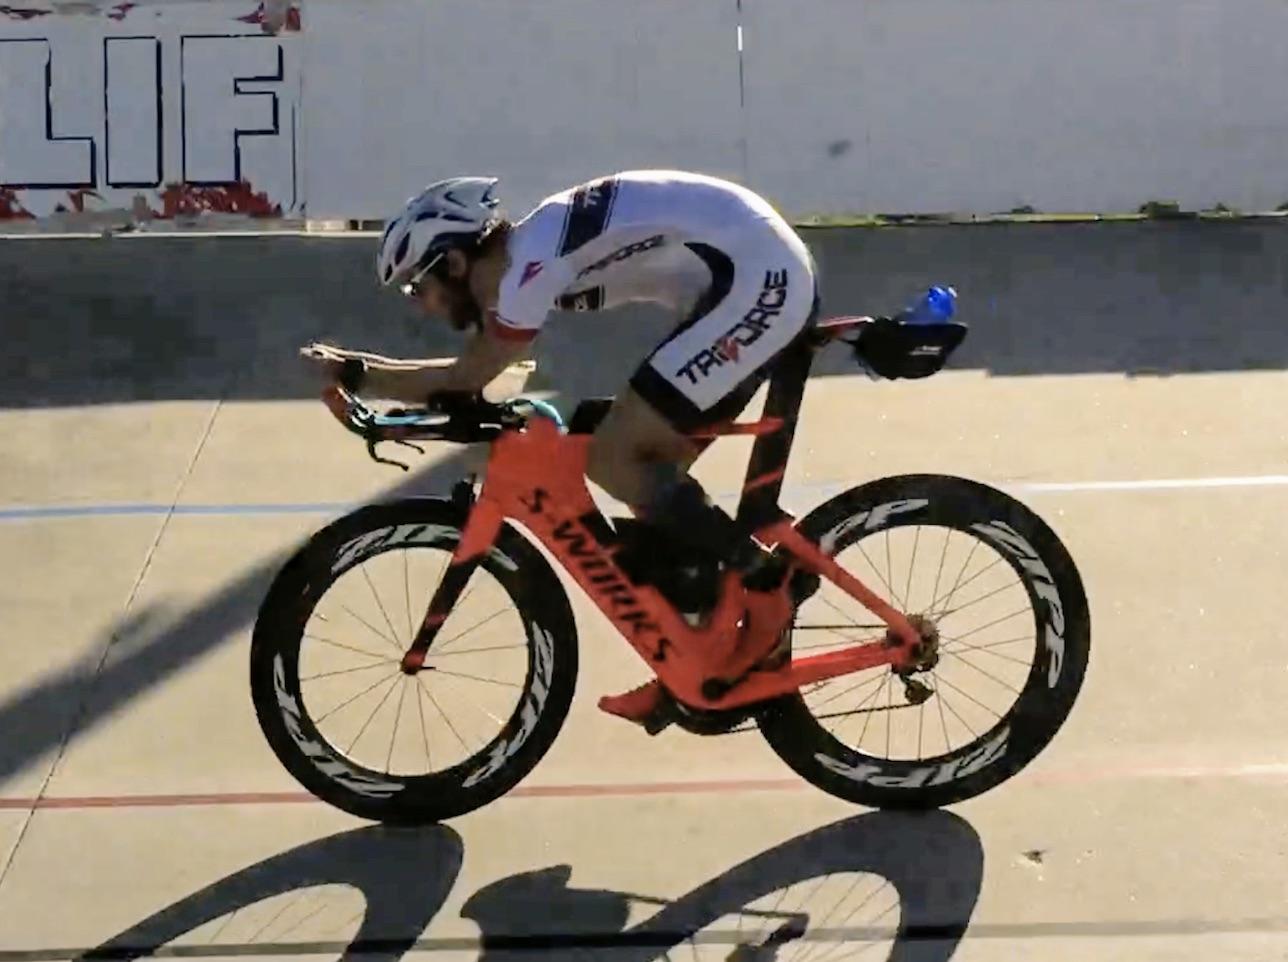 triathlon aero forum slowtwitch visibility helmets triforce coach team